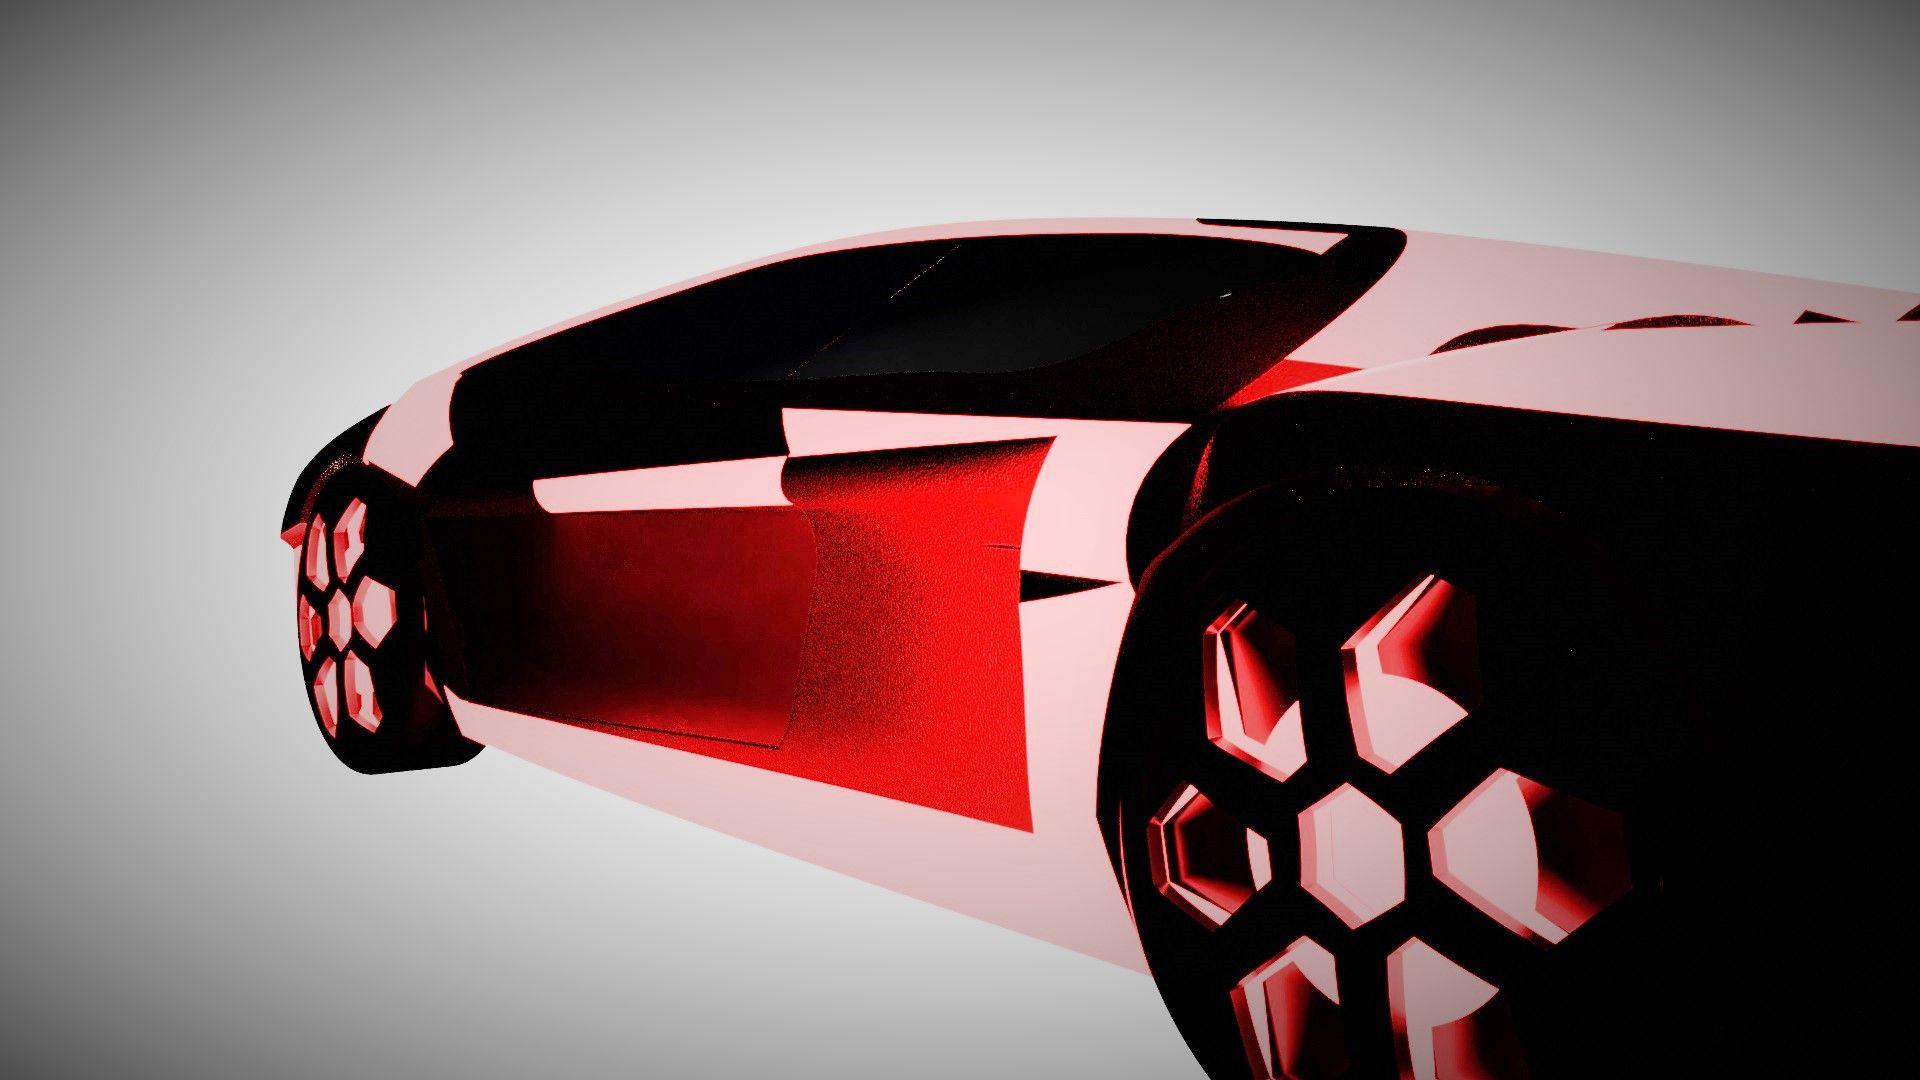 Lamborghini-2016-aug-21-12-10-01pm-000-customizedview22921769162-2-3500-3500